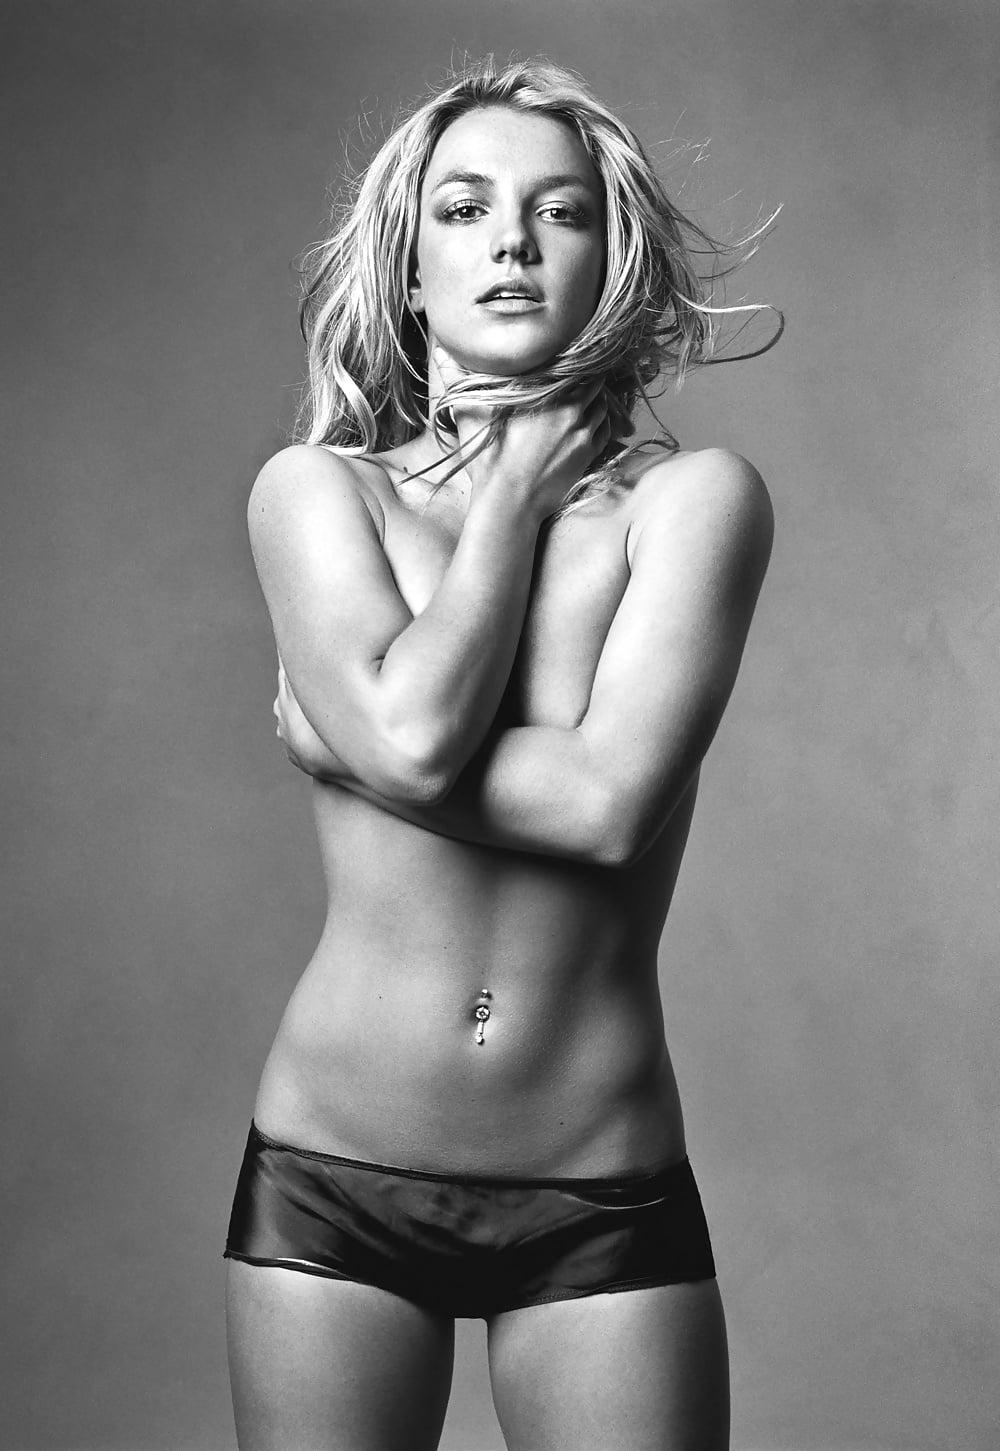 Britney spears hot bod